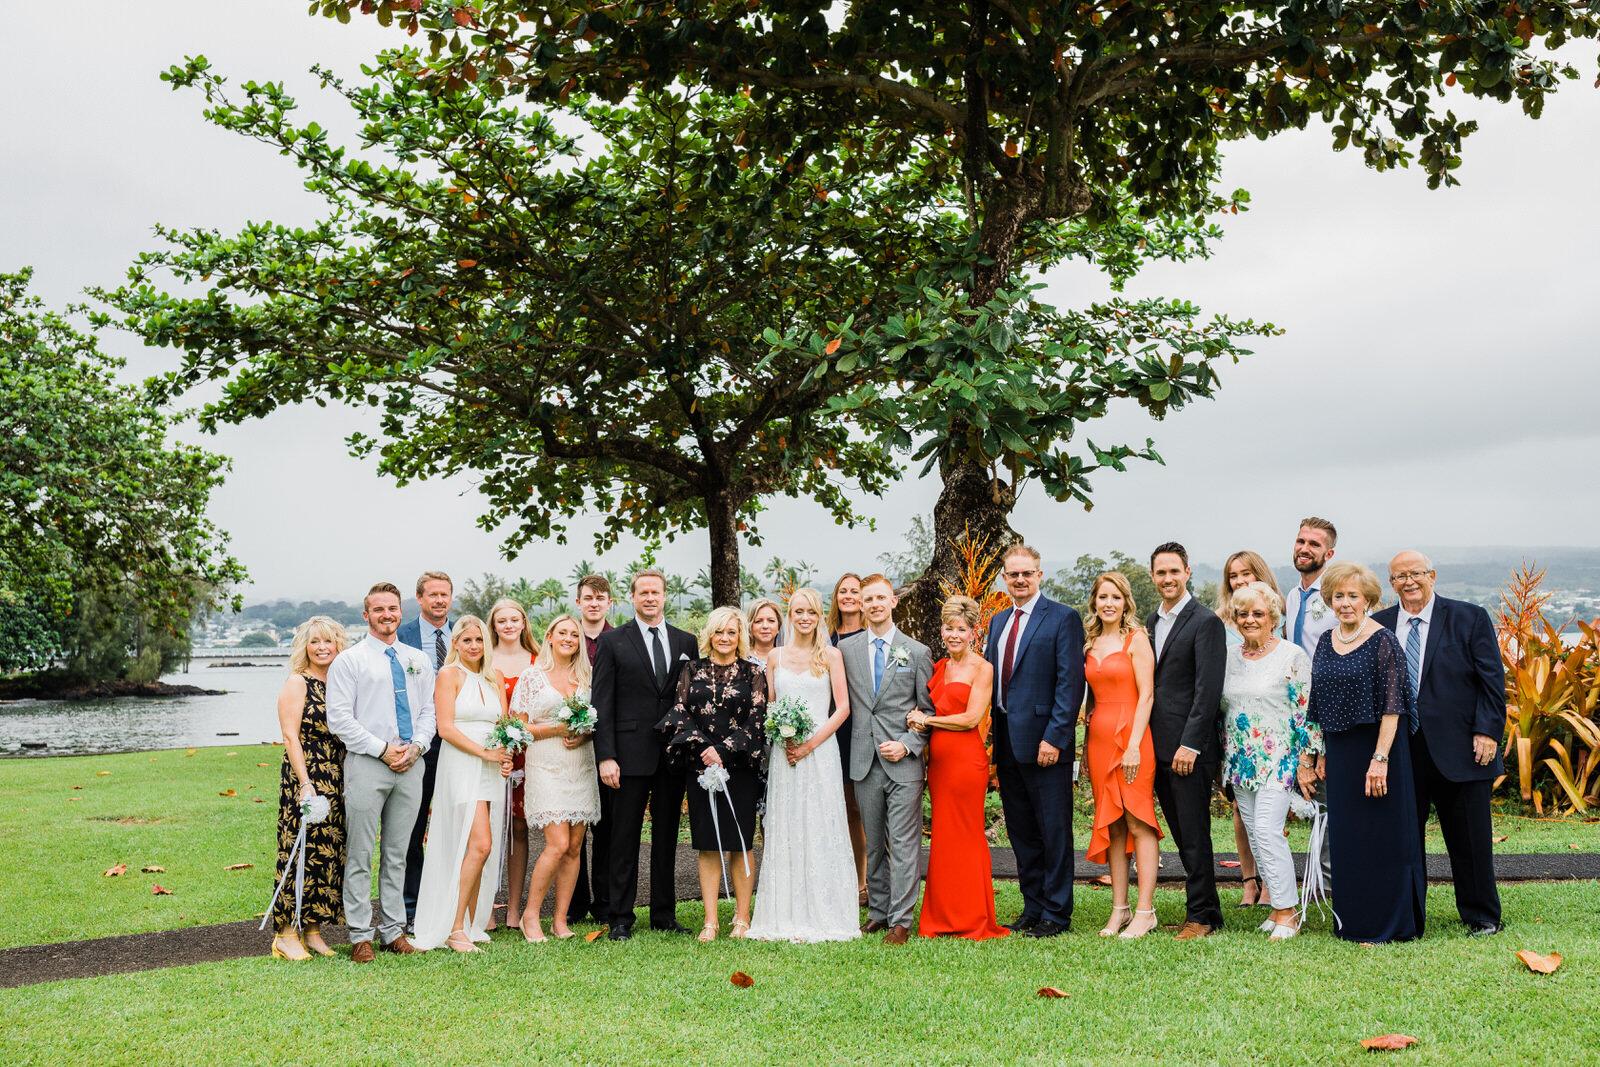 small-wedding-hawaii-destination-hilton-coconut-island-9892-1.jpg